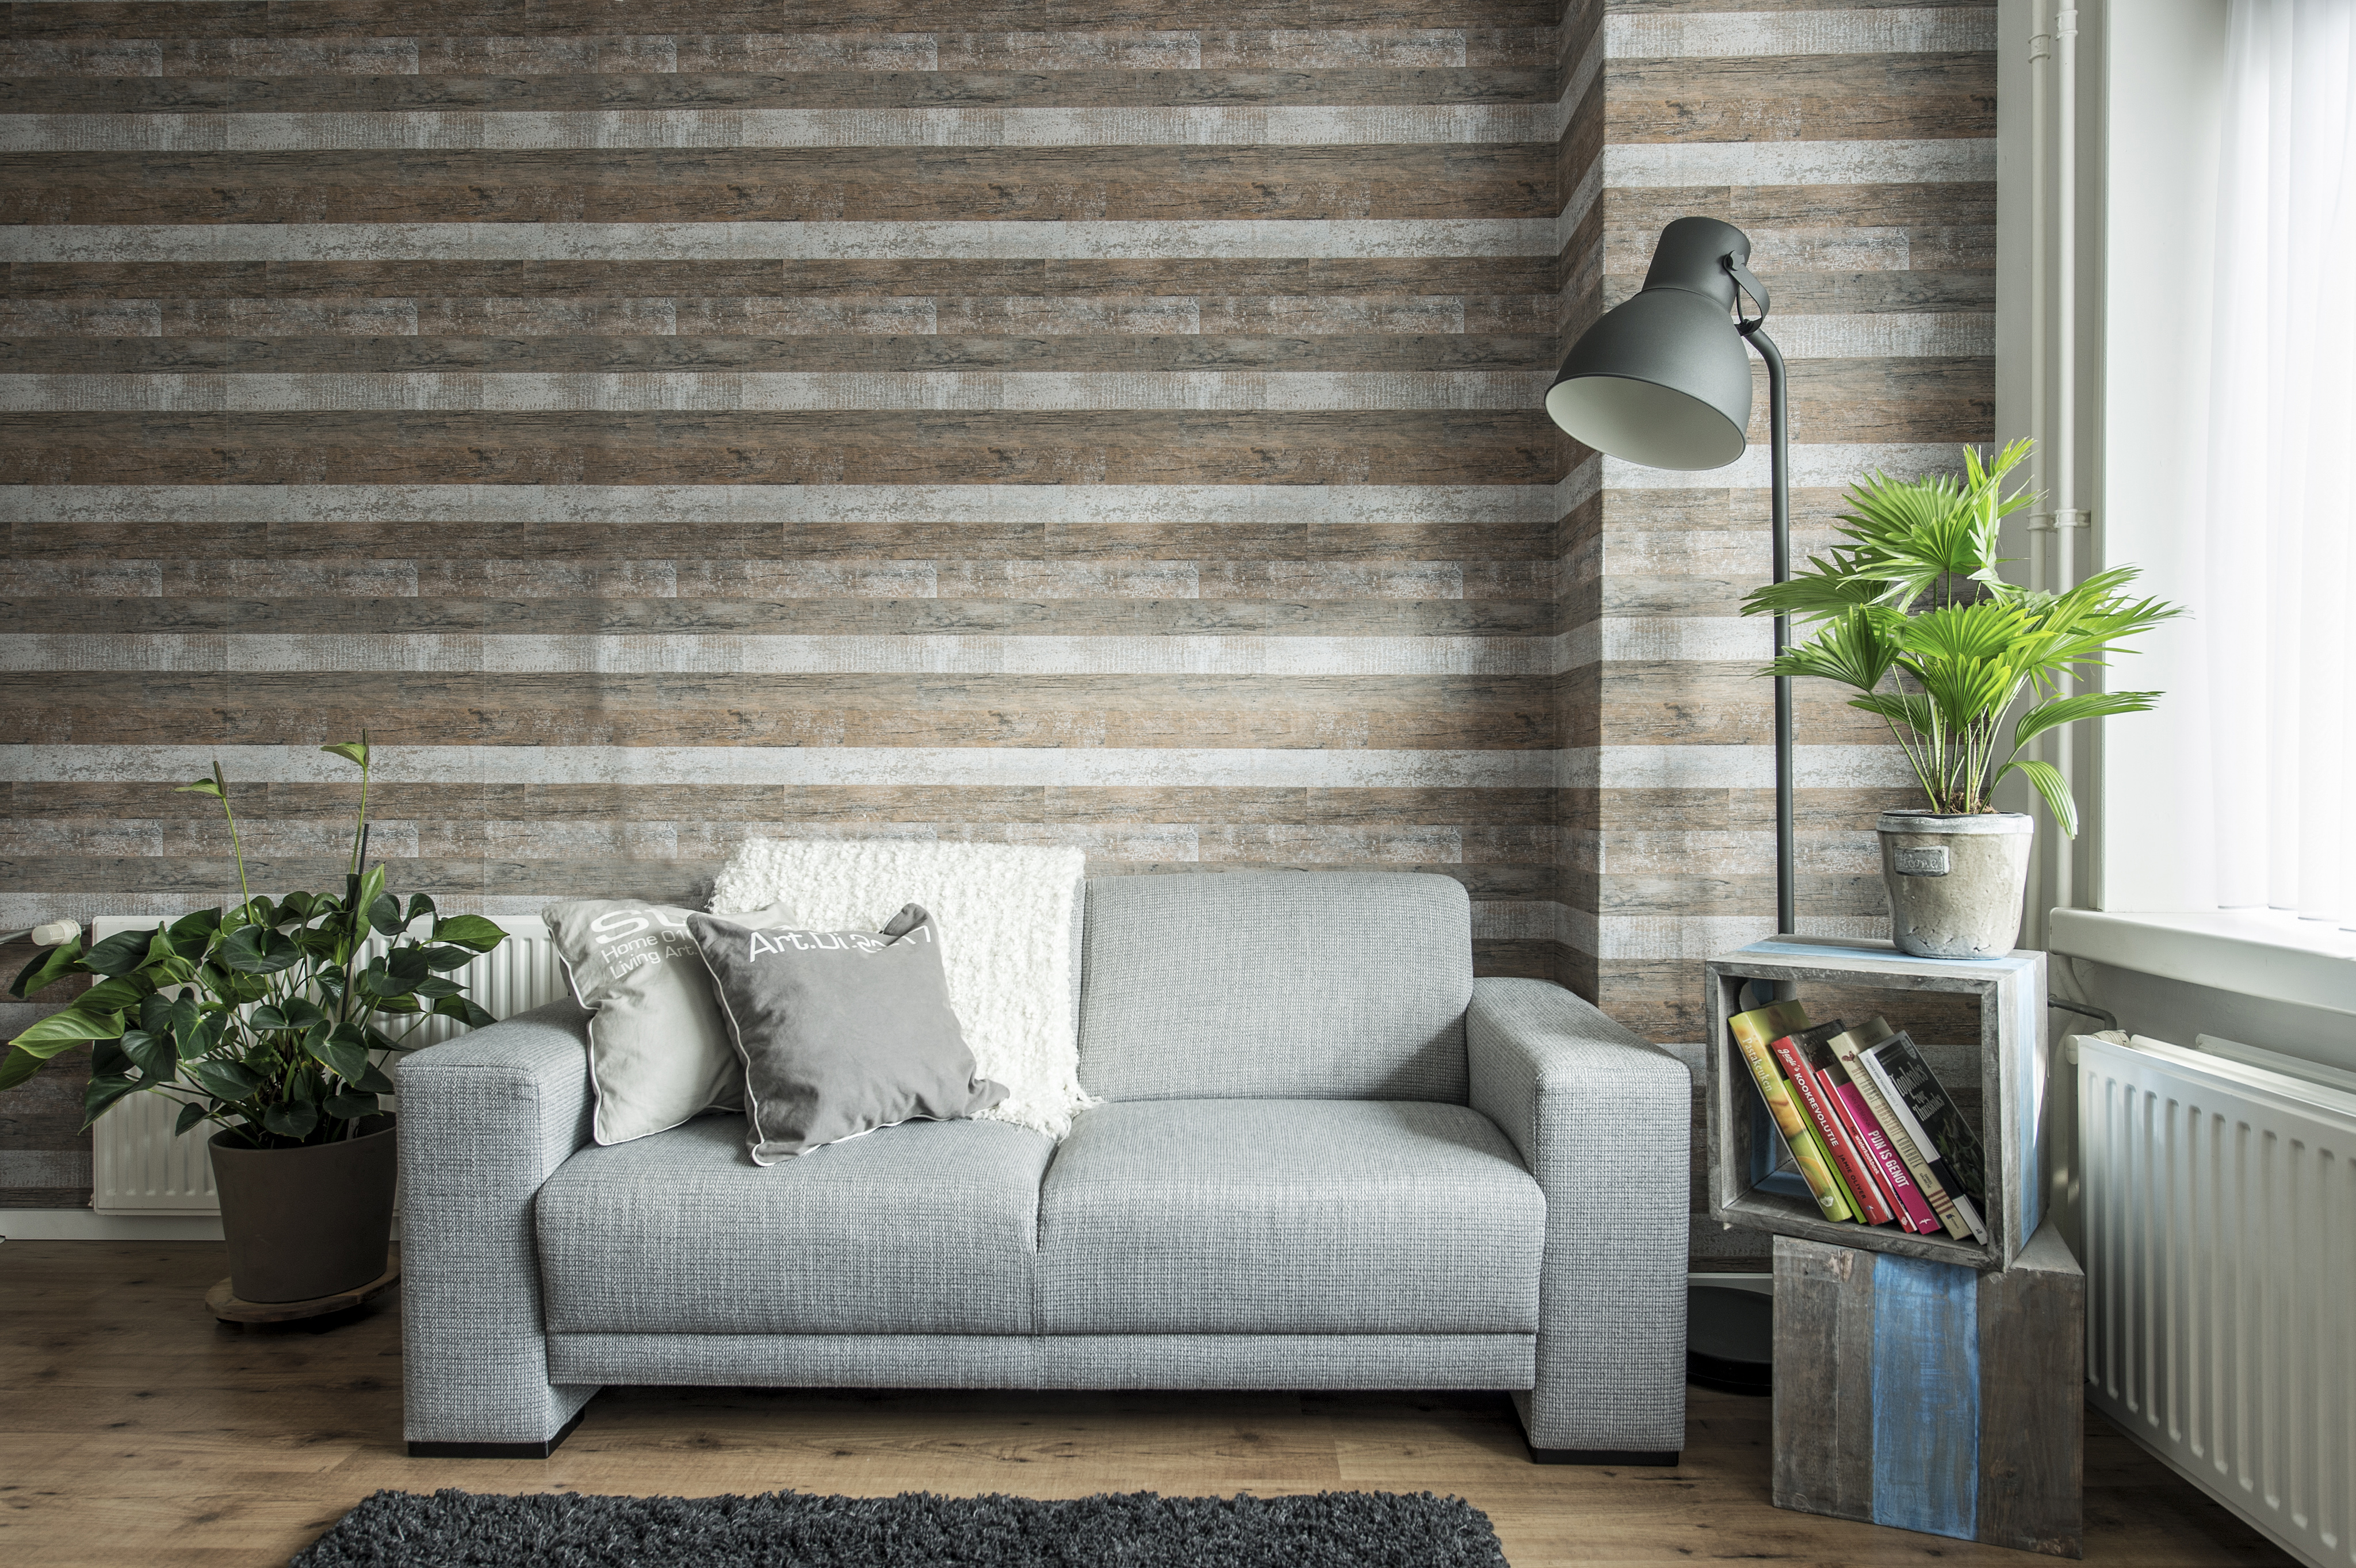 Steigerhout Behang Slaapkamer : Slaapkamer met steigerhout. finest slaapkamer met steigerhout with